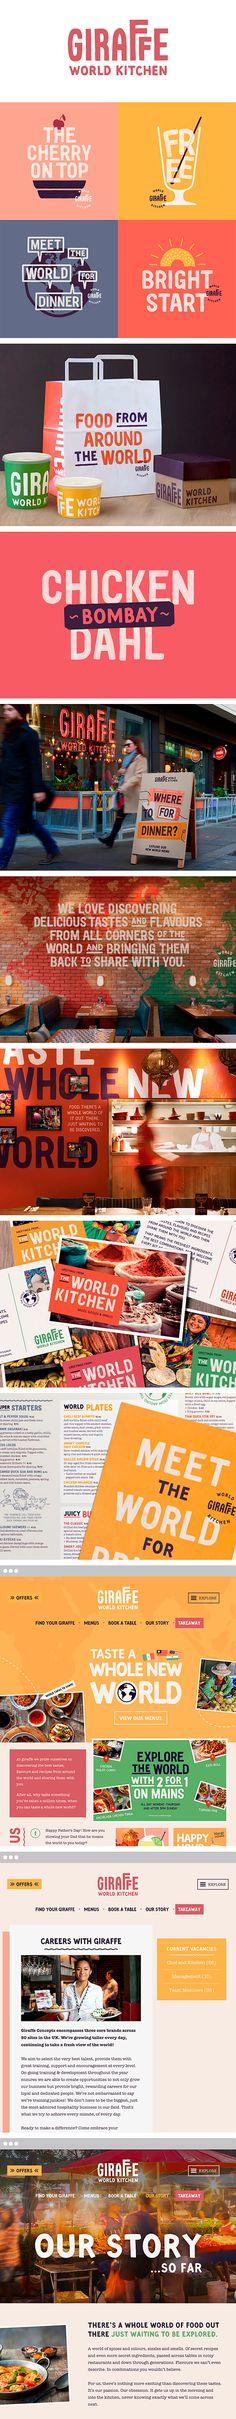 More corporate-designs are collected on: https://pinterest.com/rothenhaeusler/best-of-corporate-design/ · Agency: Ragged Edge · Client: Giraffe | World Kitchen #branding #identity #corporatedesign